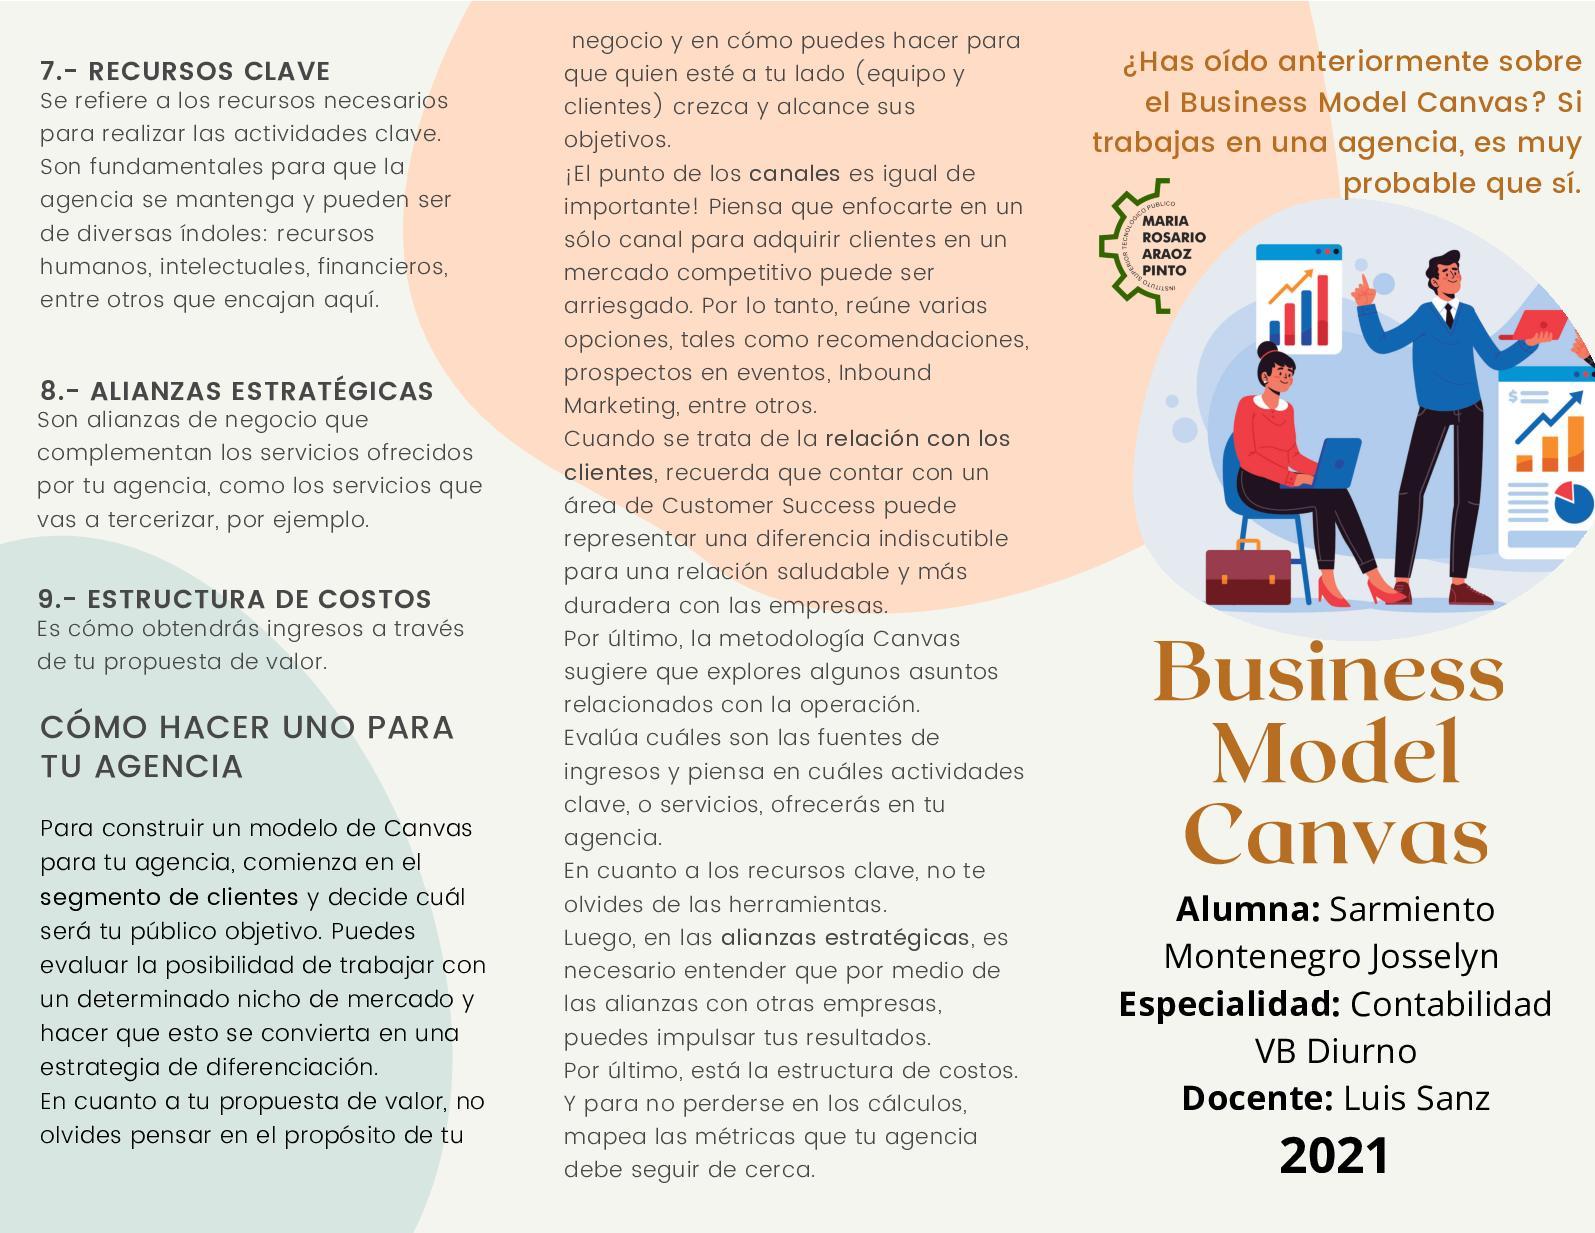 Business Model Canvas - Triptico